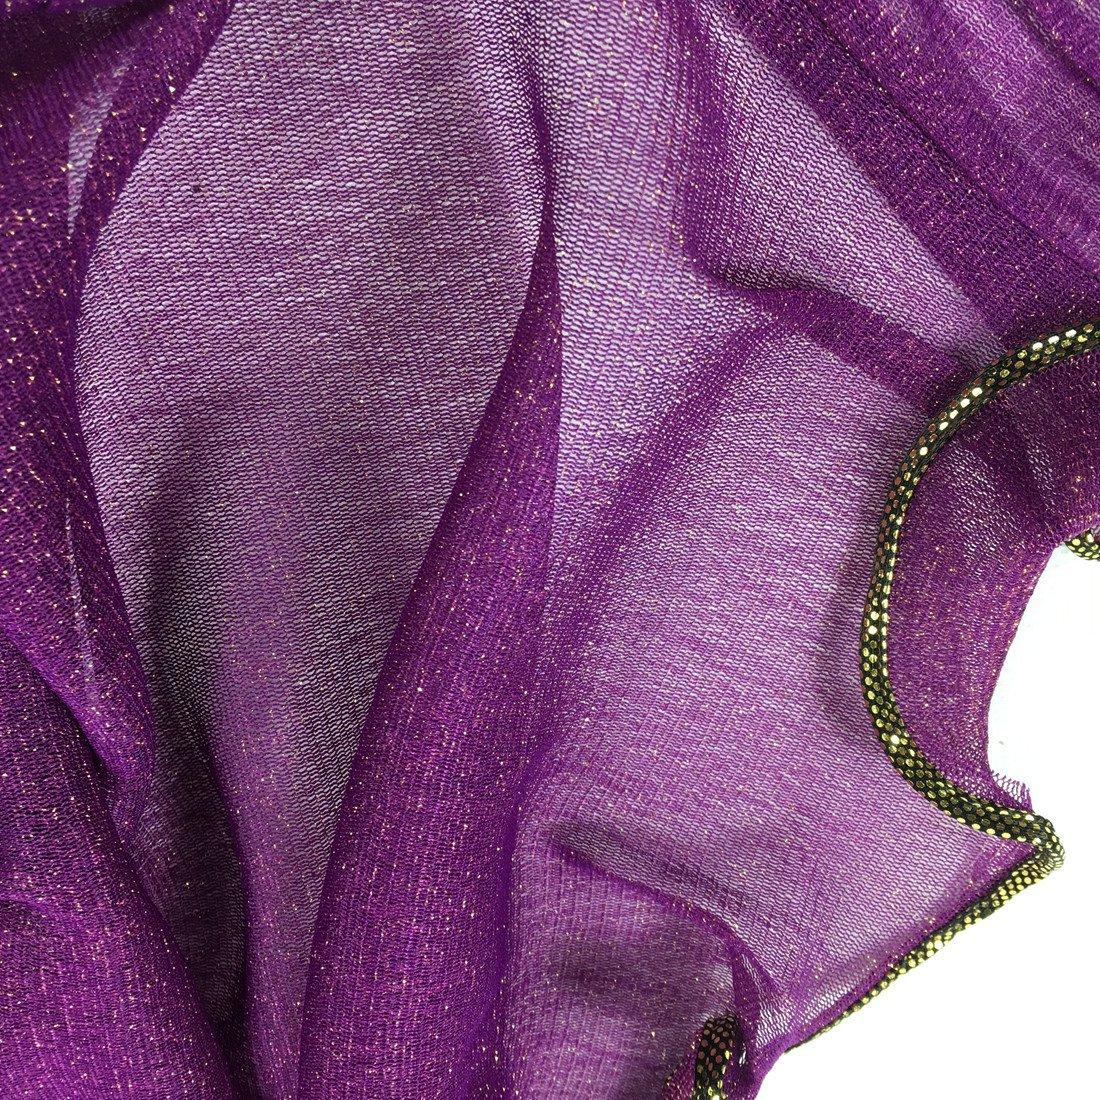 Women Vintage Scarf,Wociaosmd Women Vintage Lace Gauze Solid Scarf Winter Warm Shawl Wrap